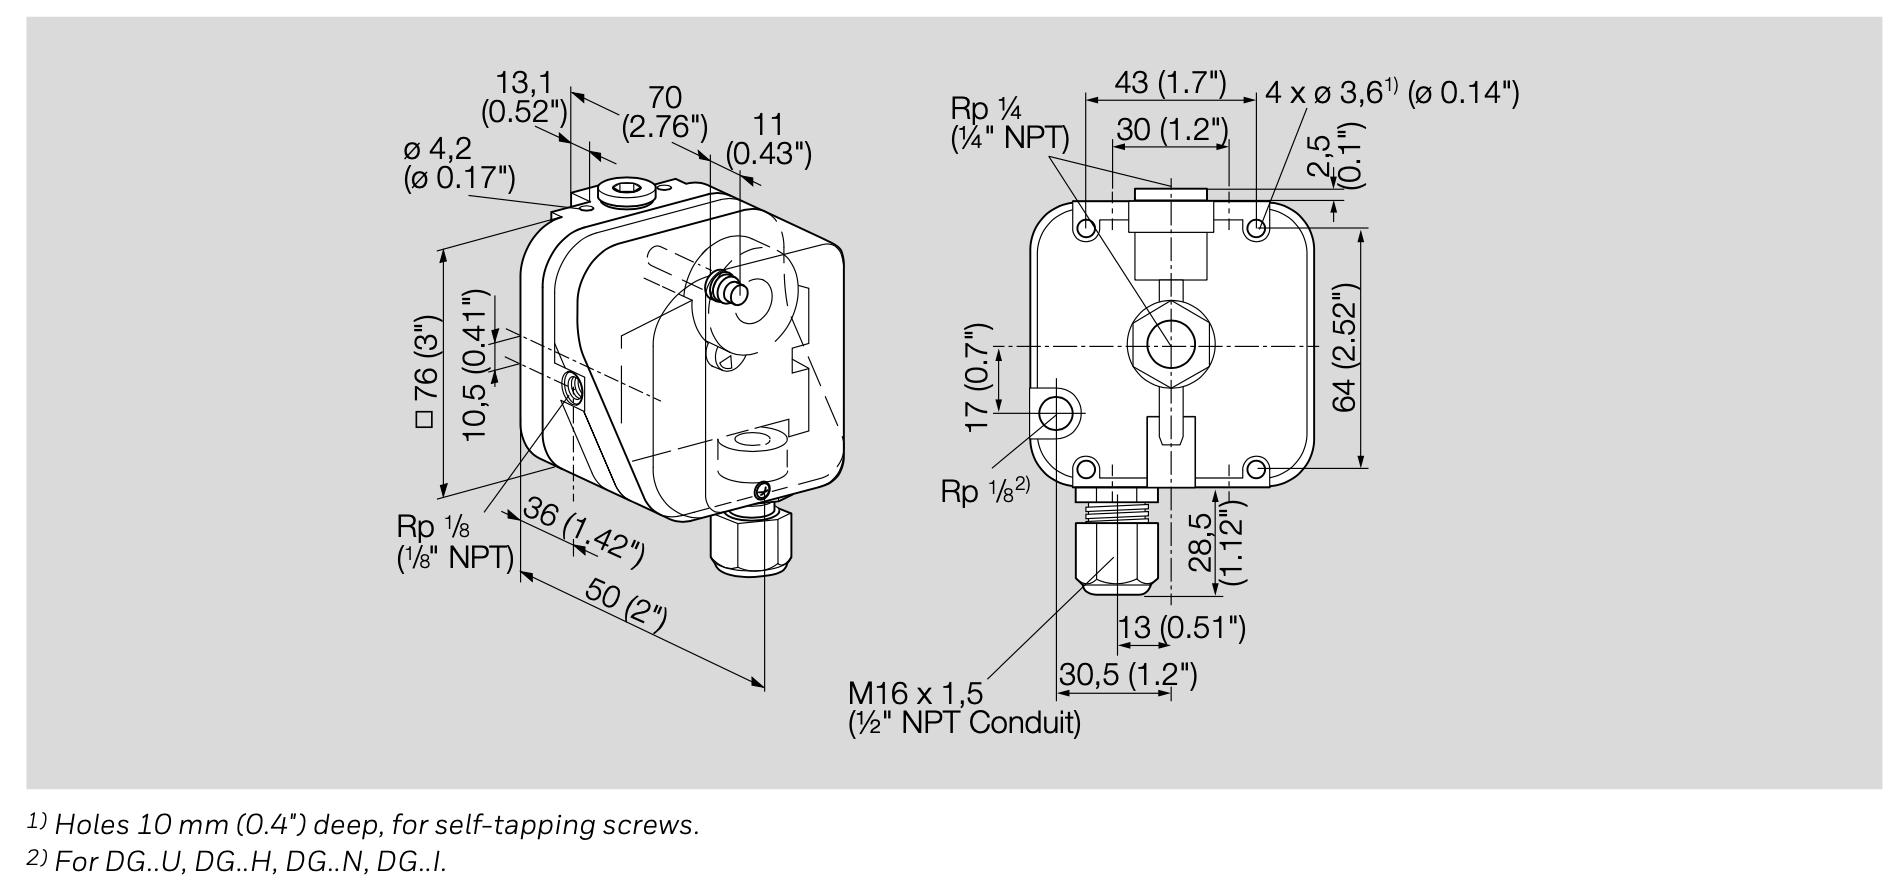 KROM Pressure Switch dimension